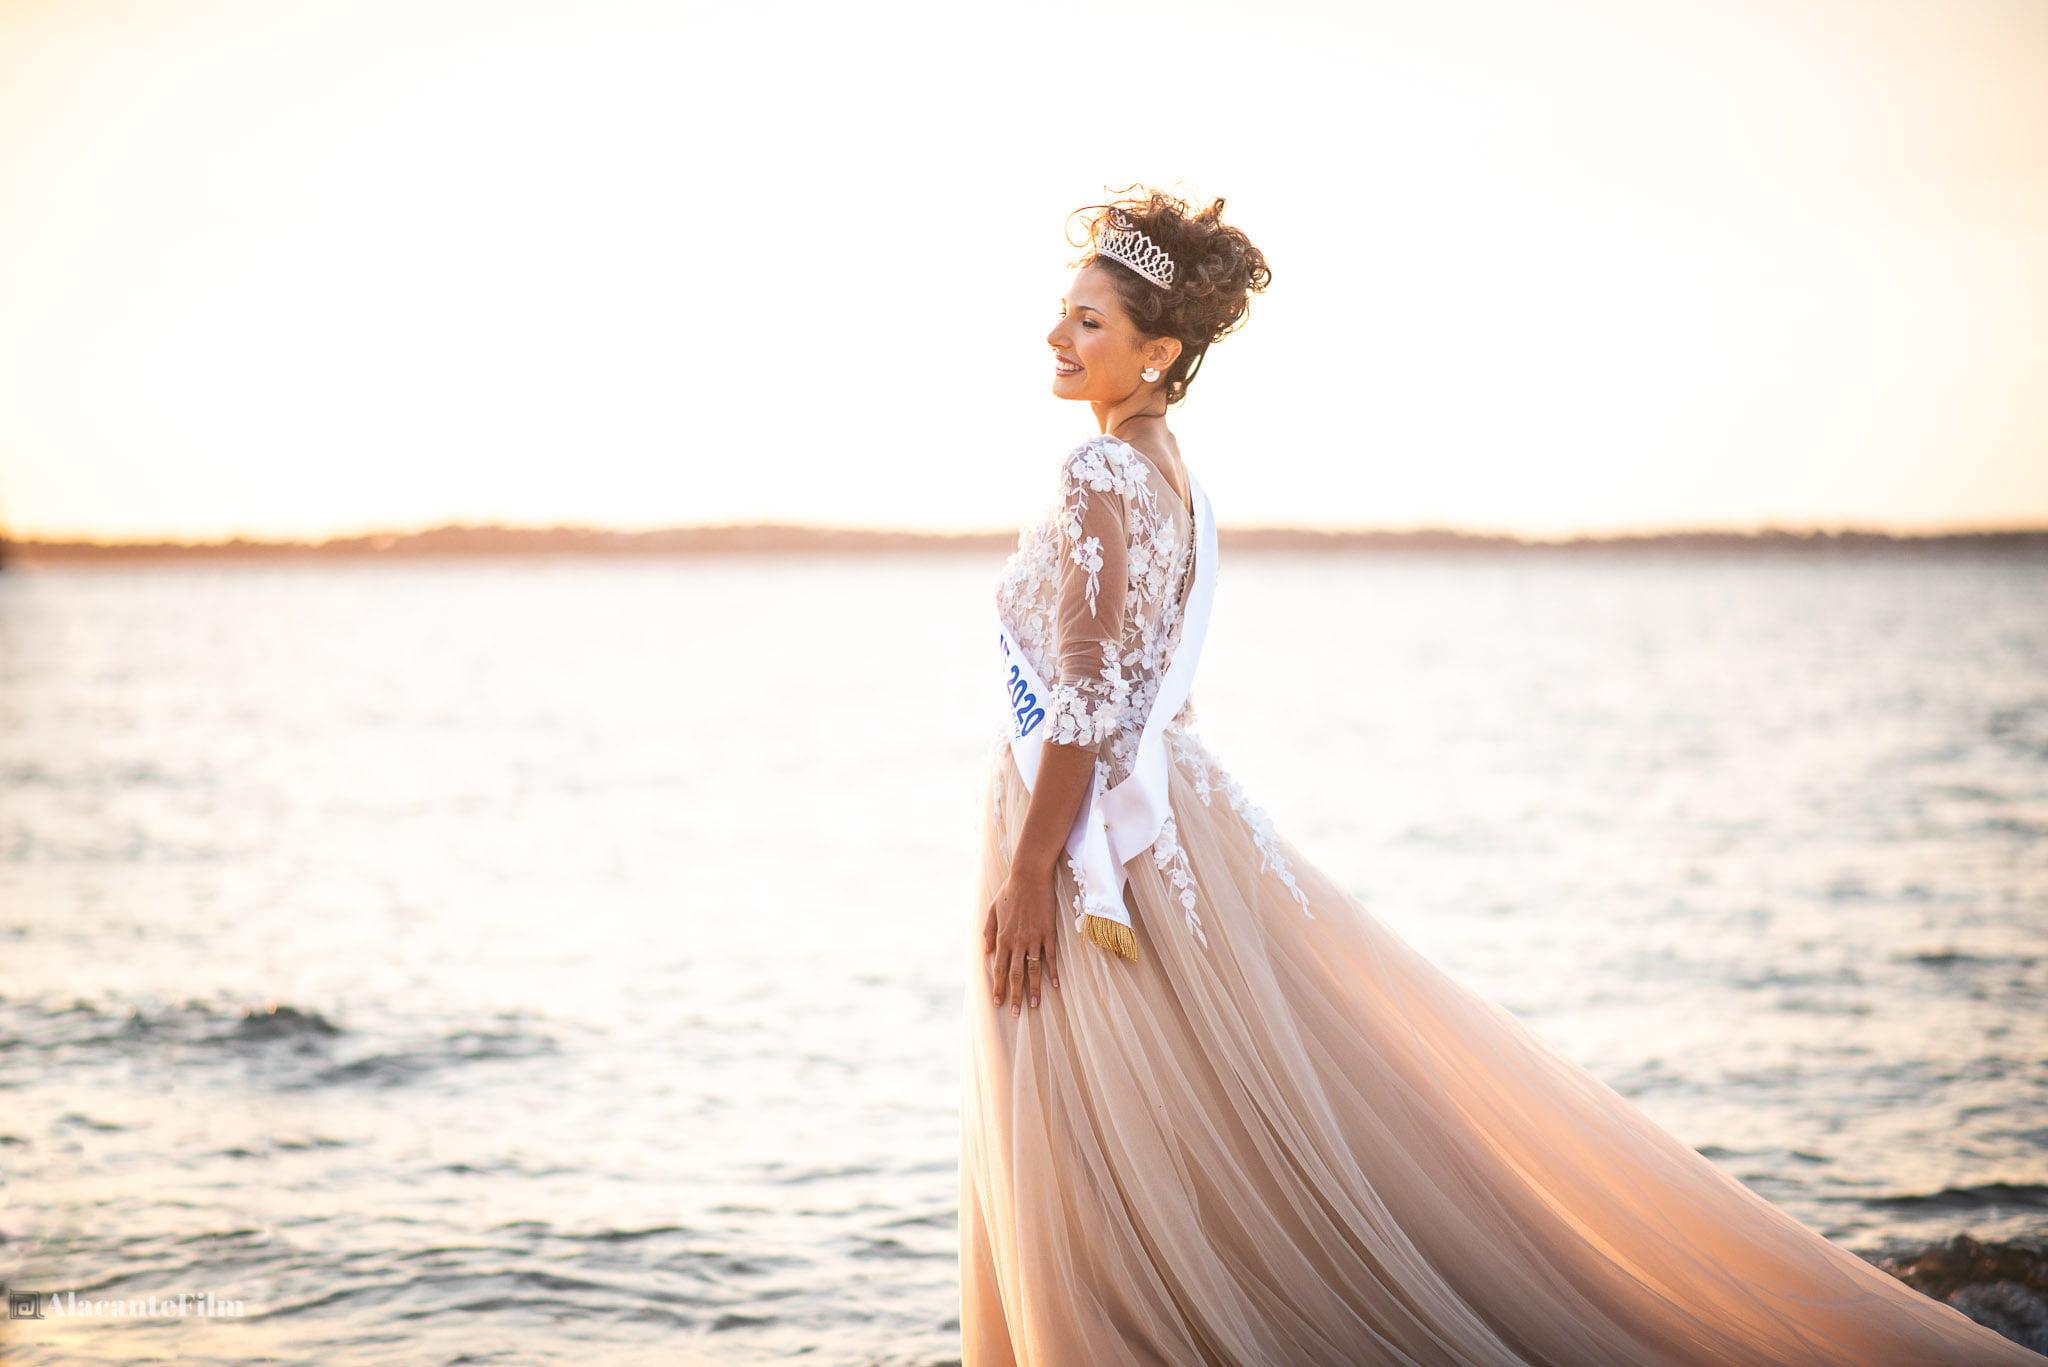 Miss Aquitaine Leila Veslard Bassin Arcachon 2020